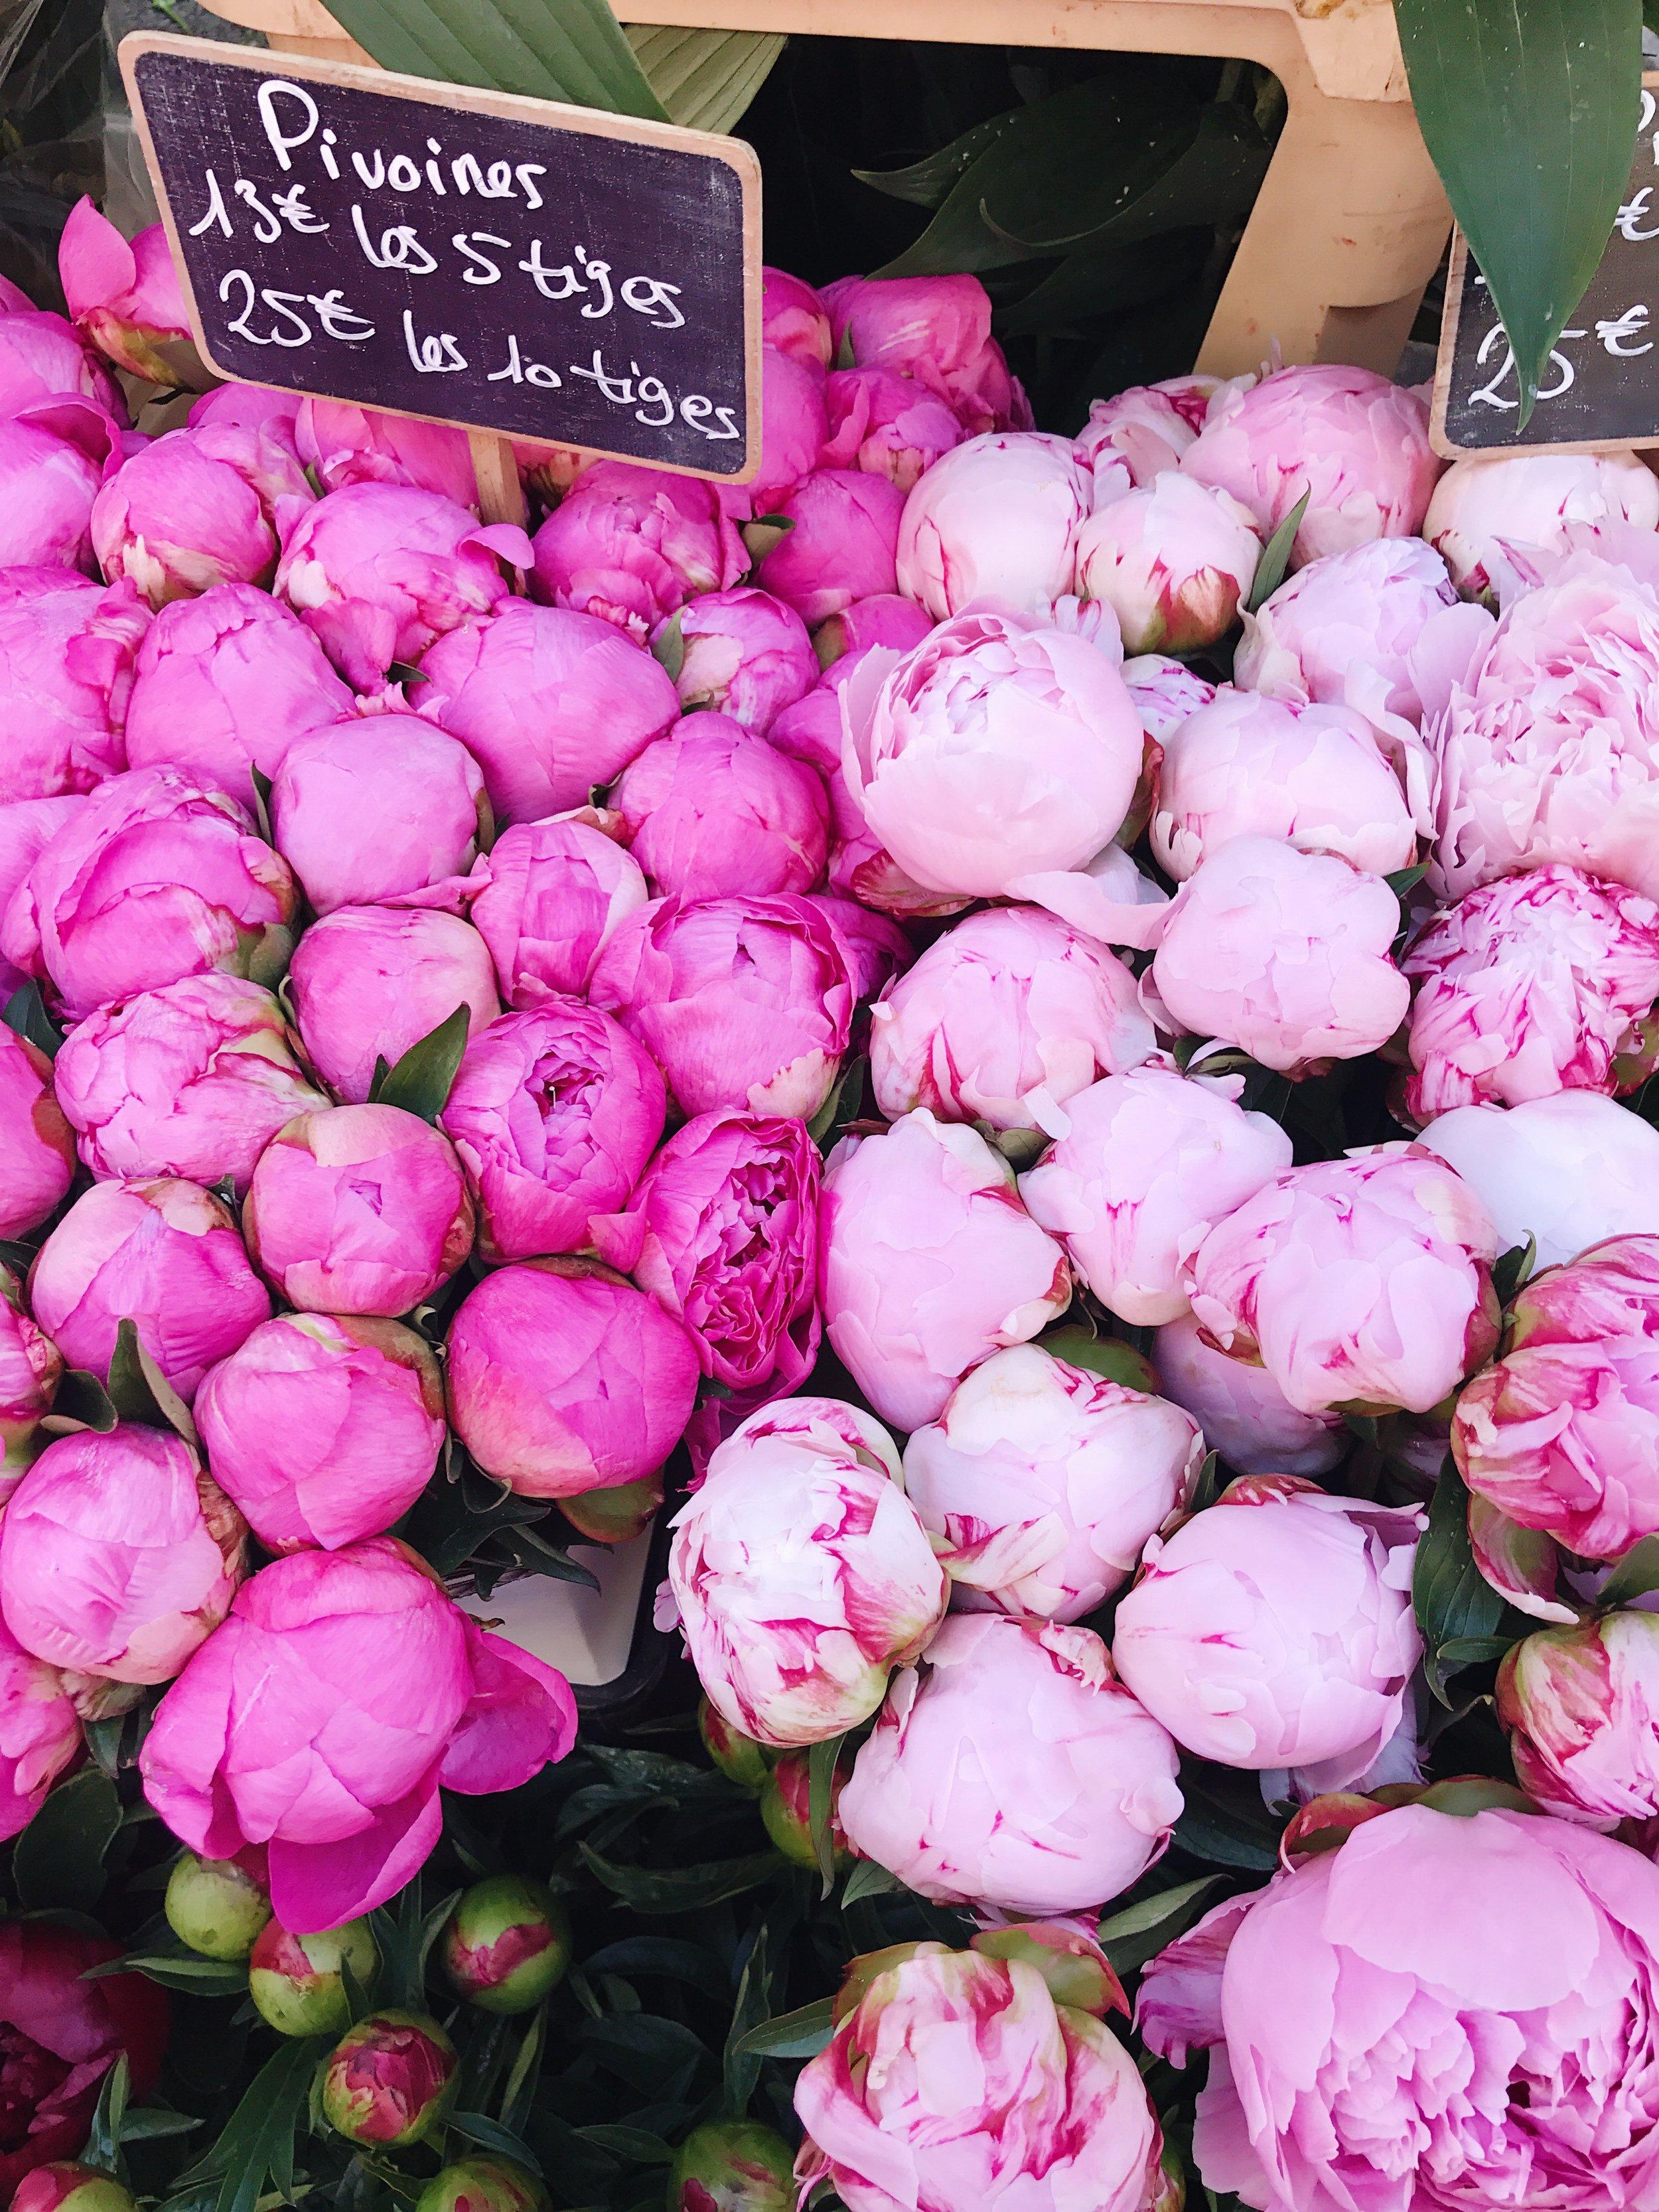 Beautiful Parisian farmer's market finds.